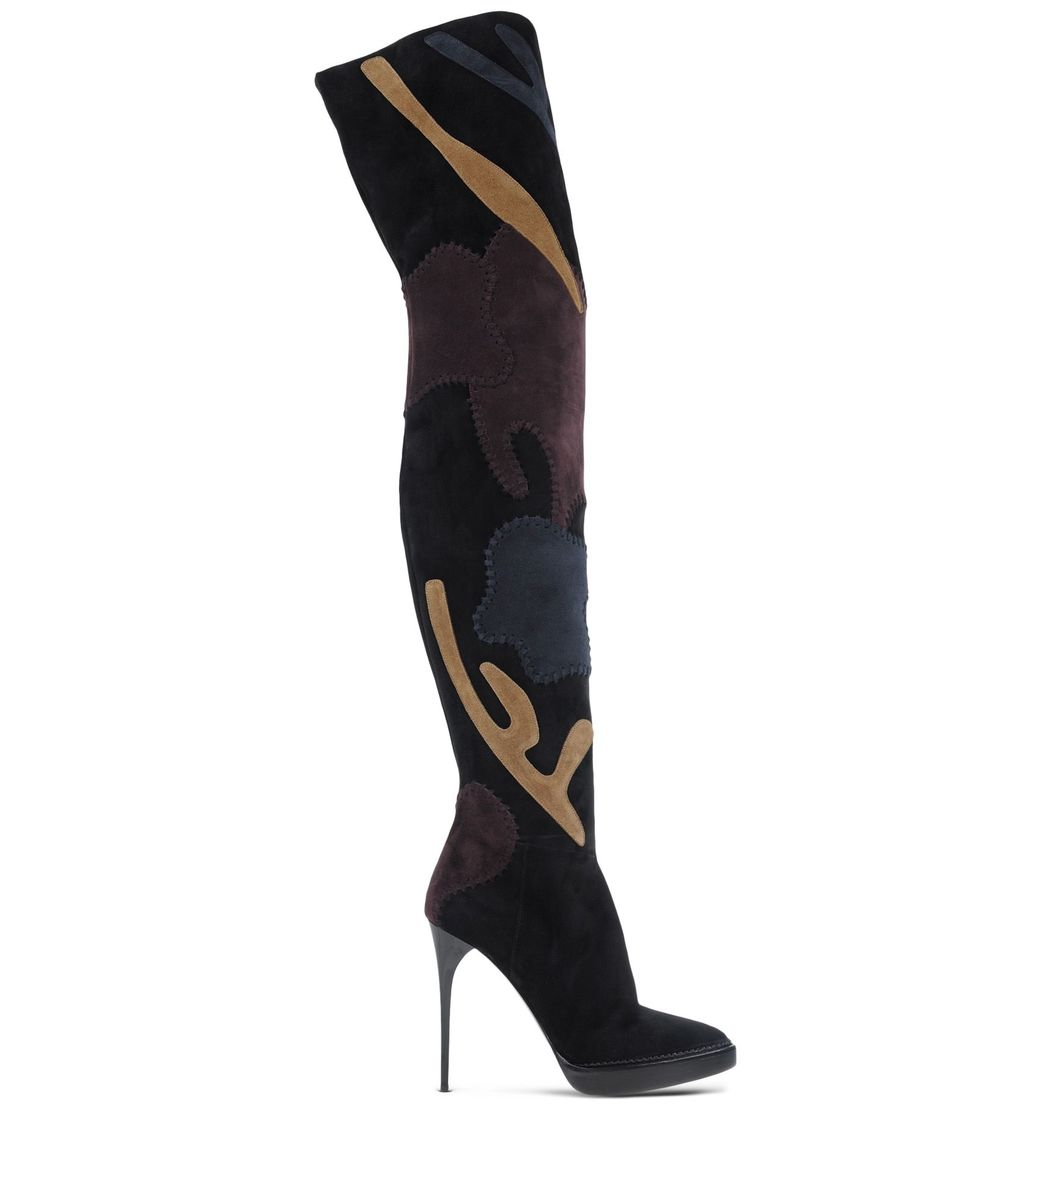 ShopBazaar Burberry Prorsum Patchwork Over-The-Knee Boot MAIN